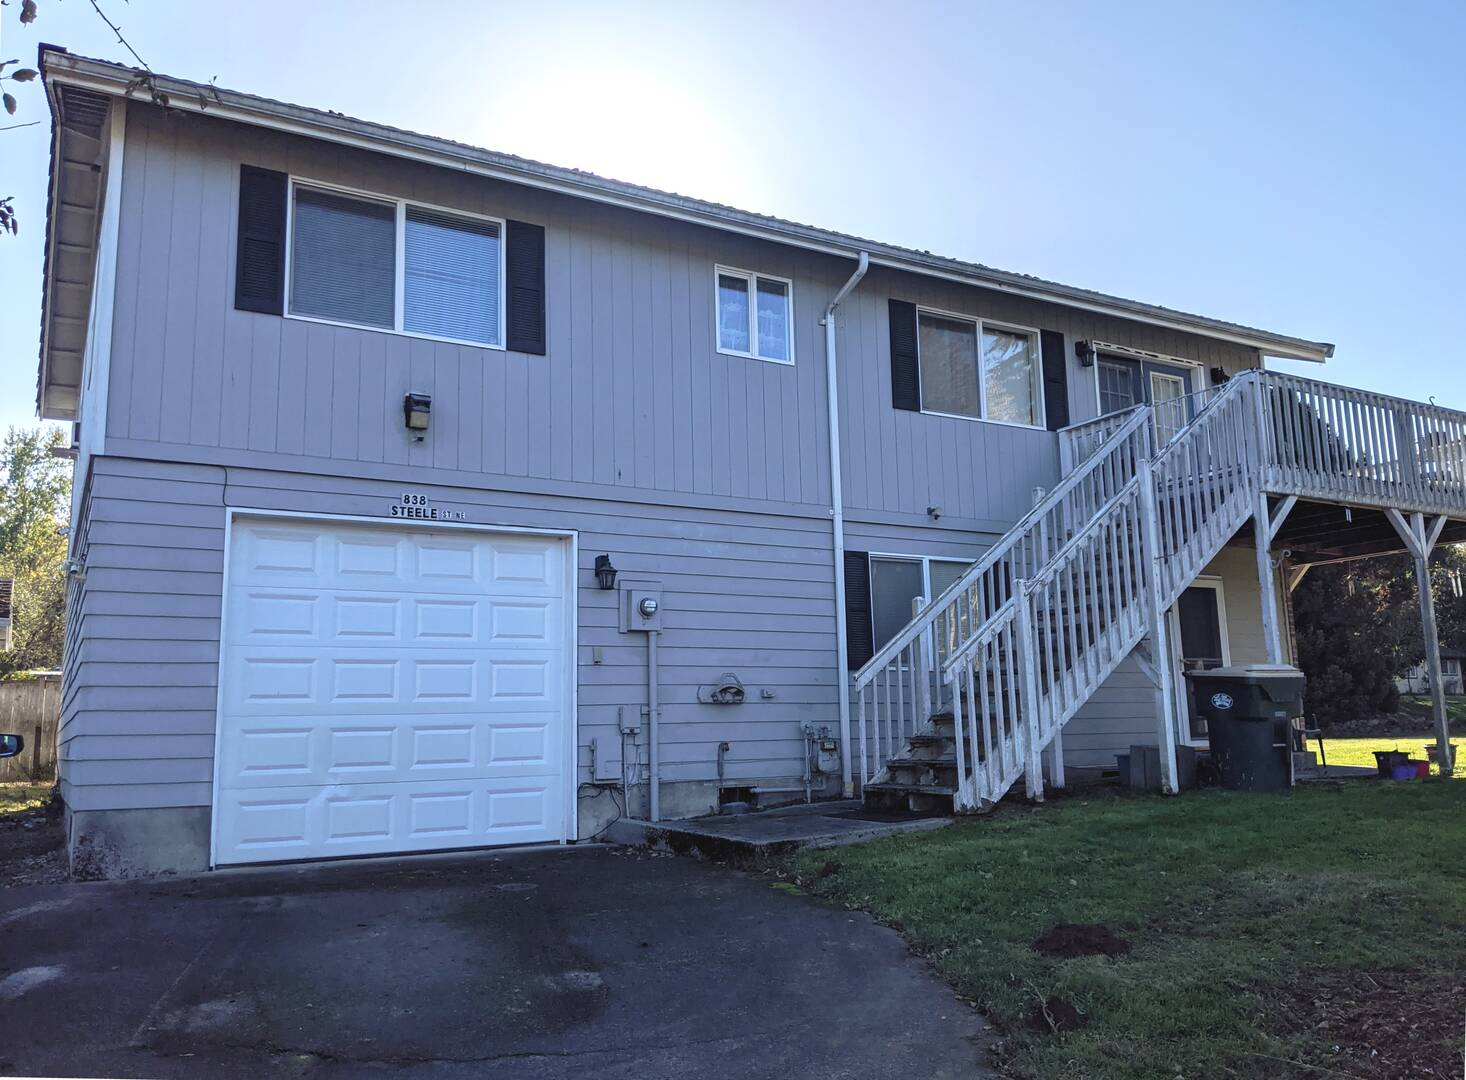 838 Steele St NE Olympia, WA 98506